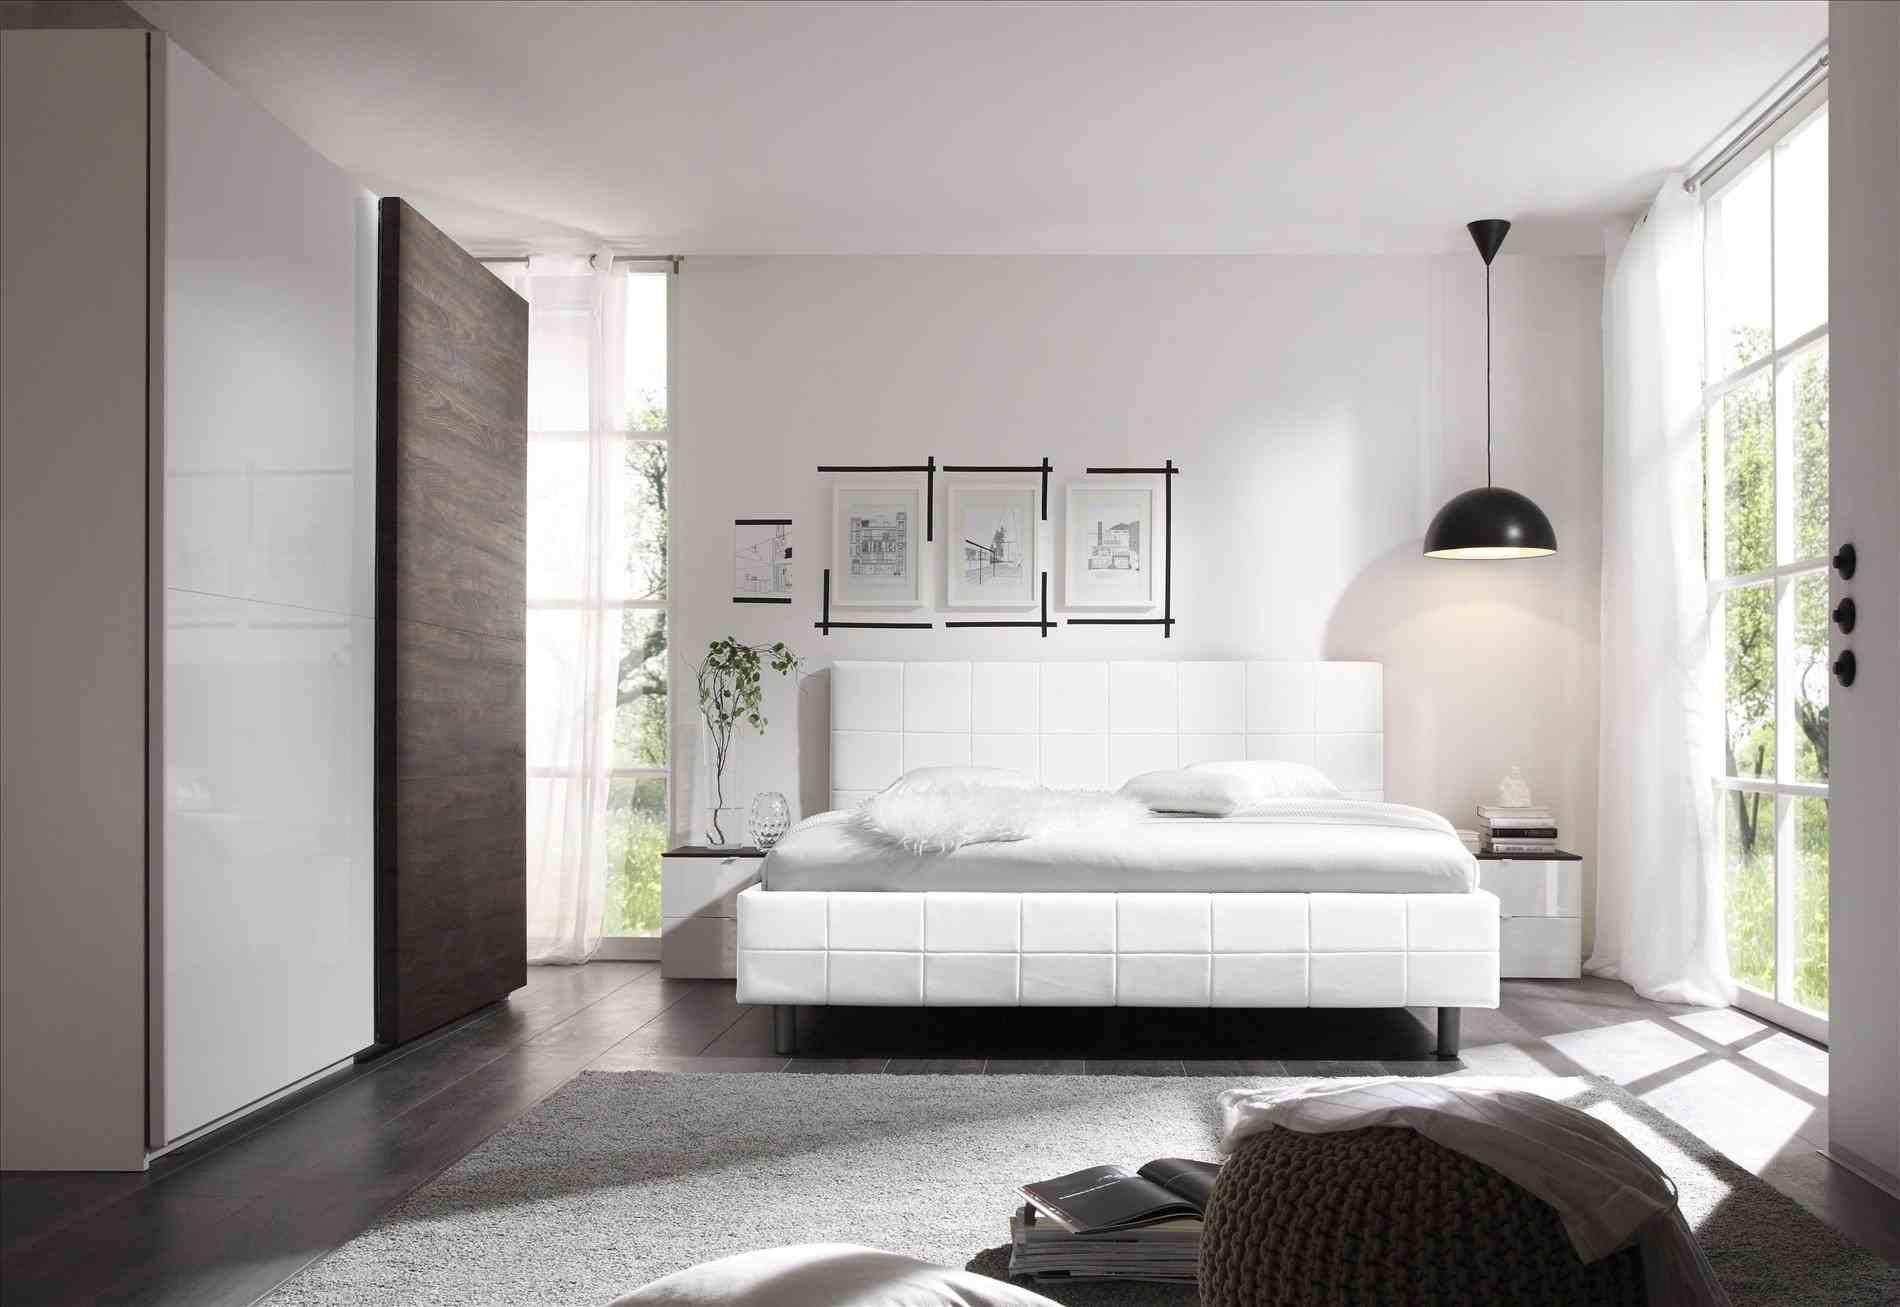 modern master bedroom with bathroom design | Home Ideas | Pinterest ...